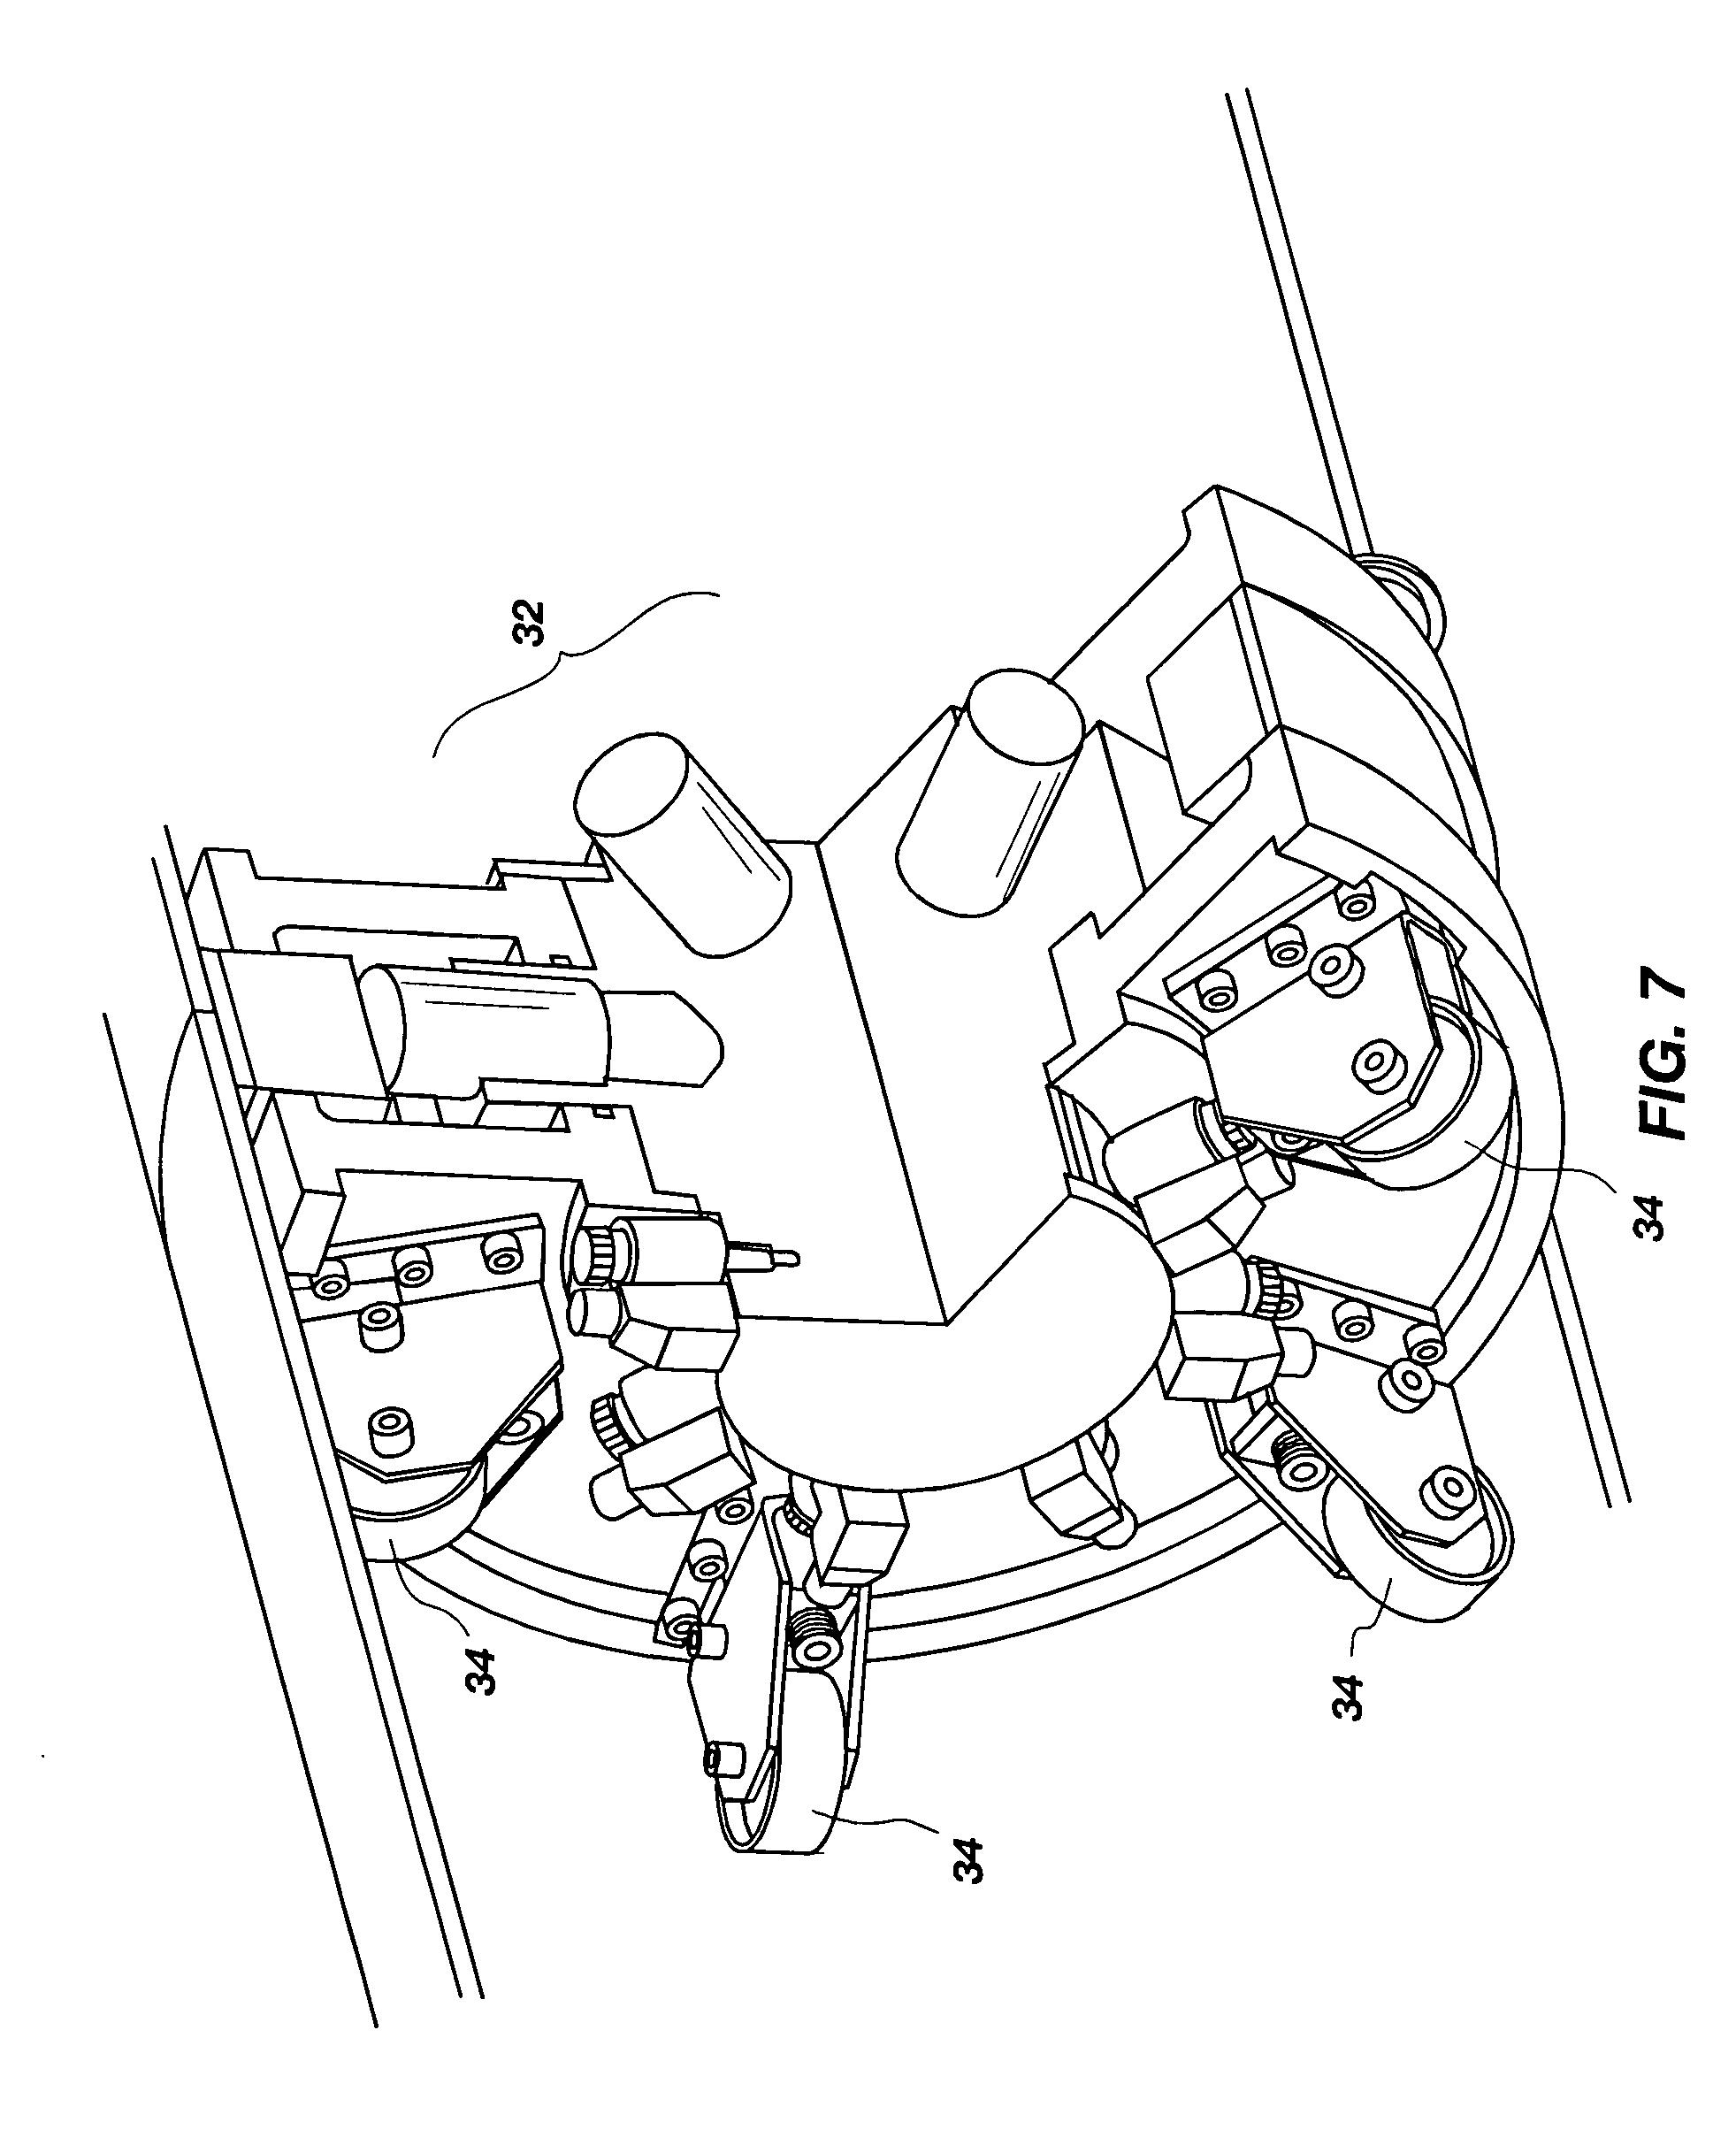 Patent Us7494040 Friction Stir Welding Improvements For Metal Citroen C4 Fuse Box Drawing